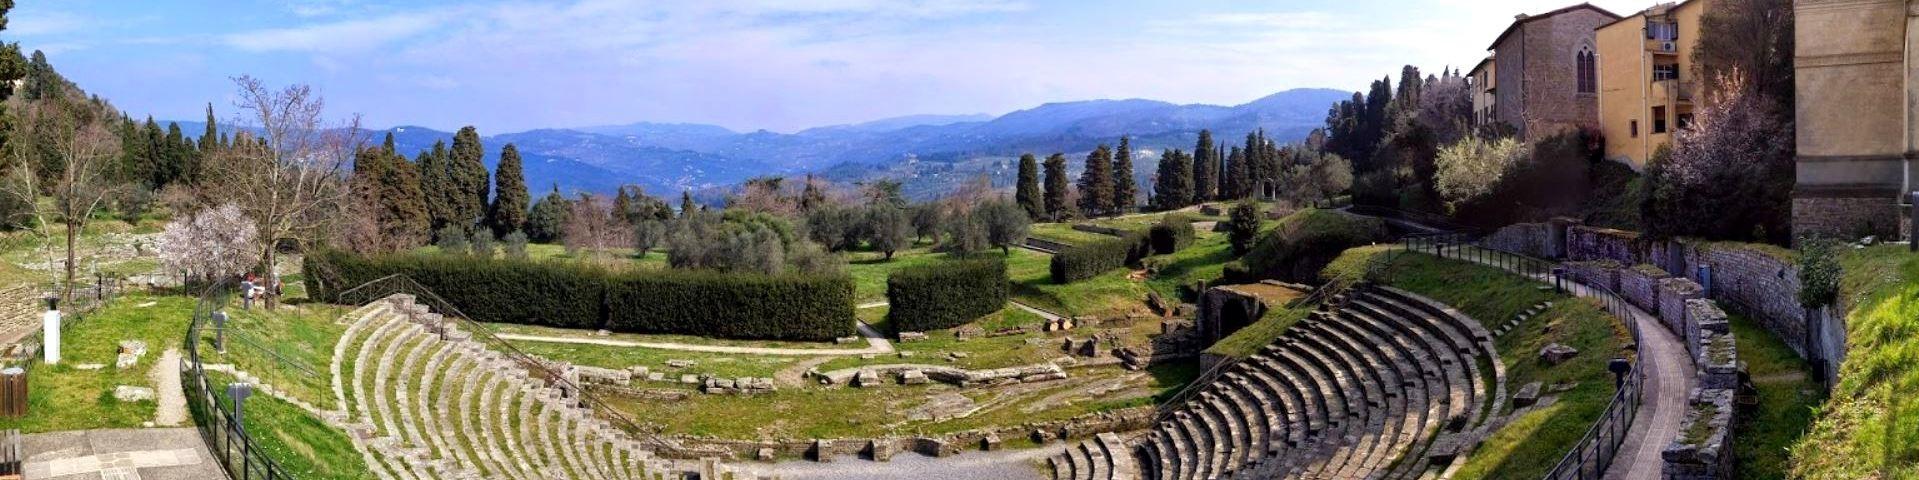 Fiesole, pozůstatky amfiteátru Teatro Romano